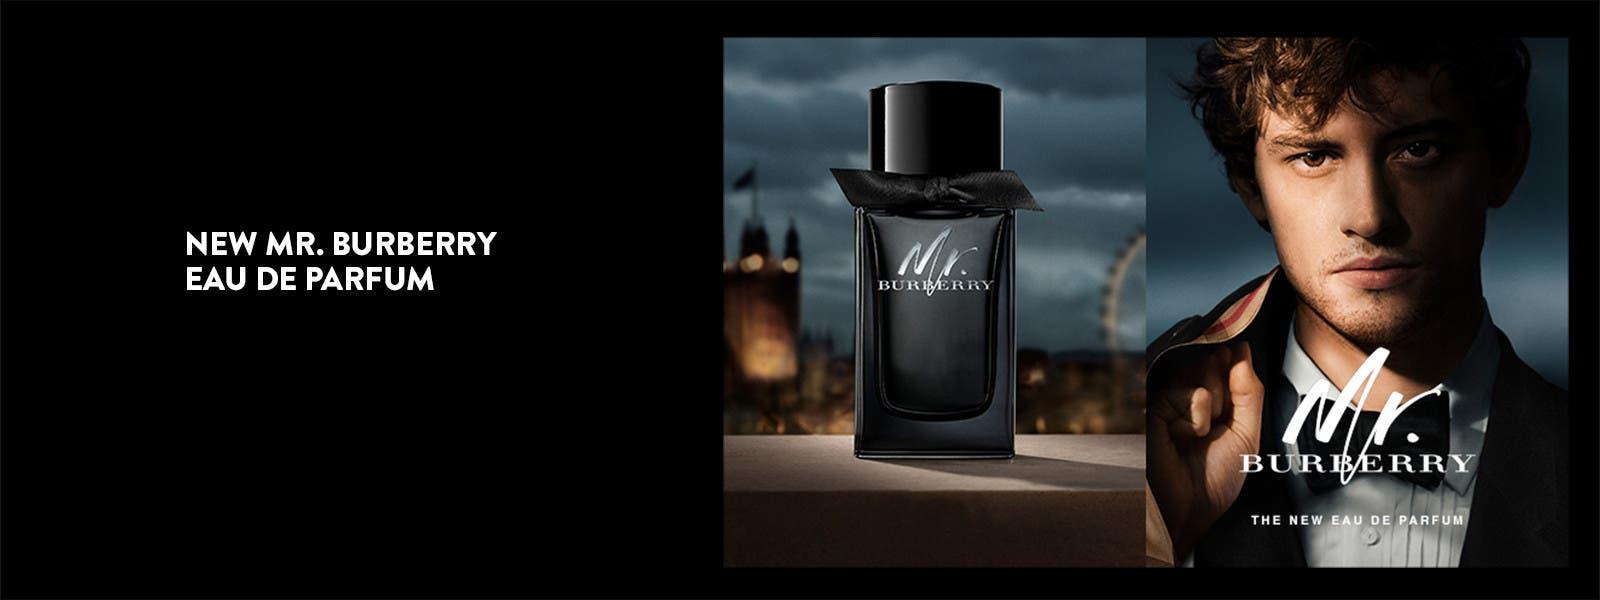 New Mr. Burberry Eau de Parfum.